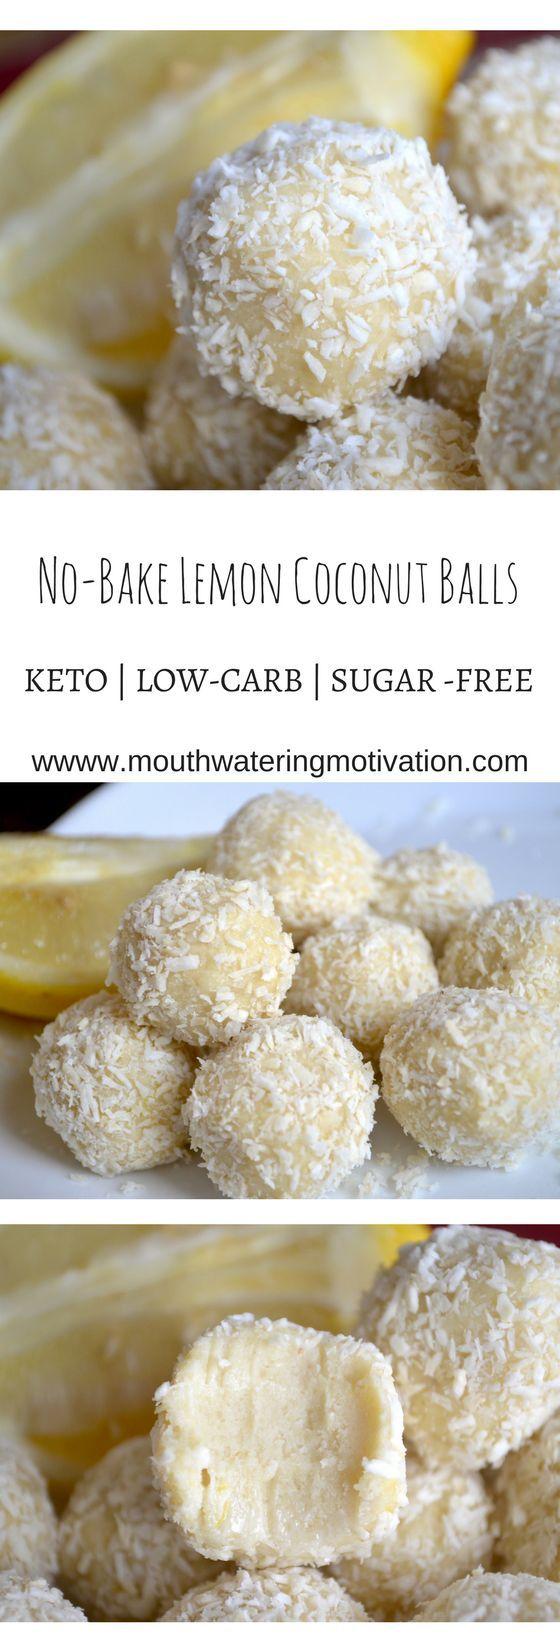 No-Bake Lemon Coconut Balls #keto #lowcarb #lemon #coconut